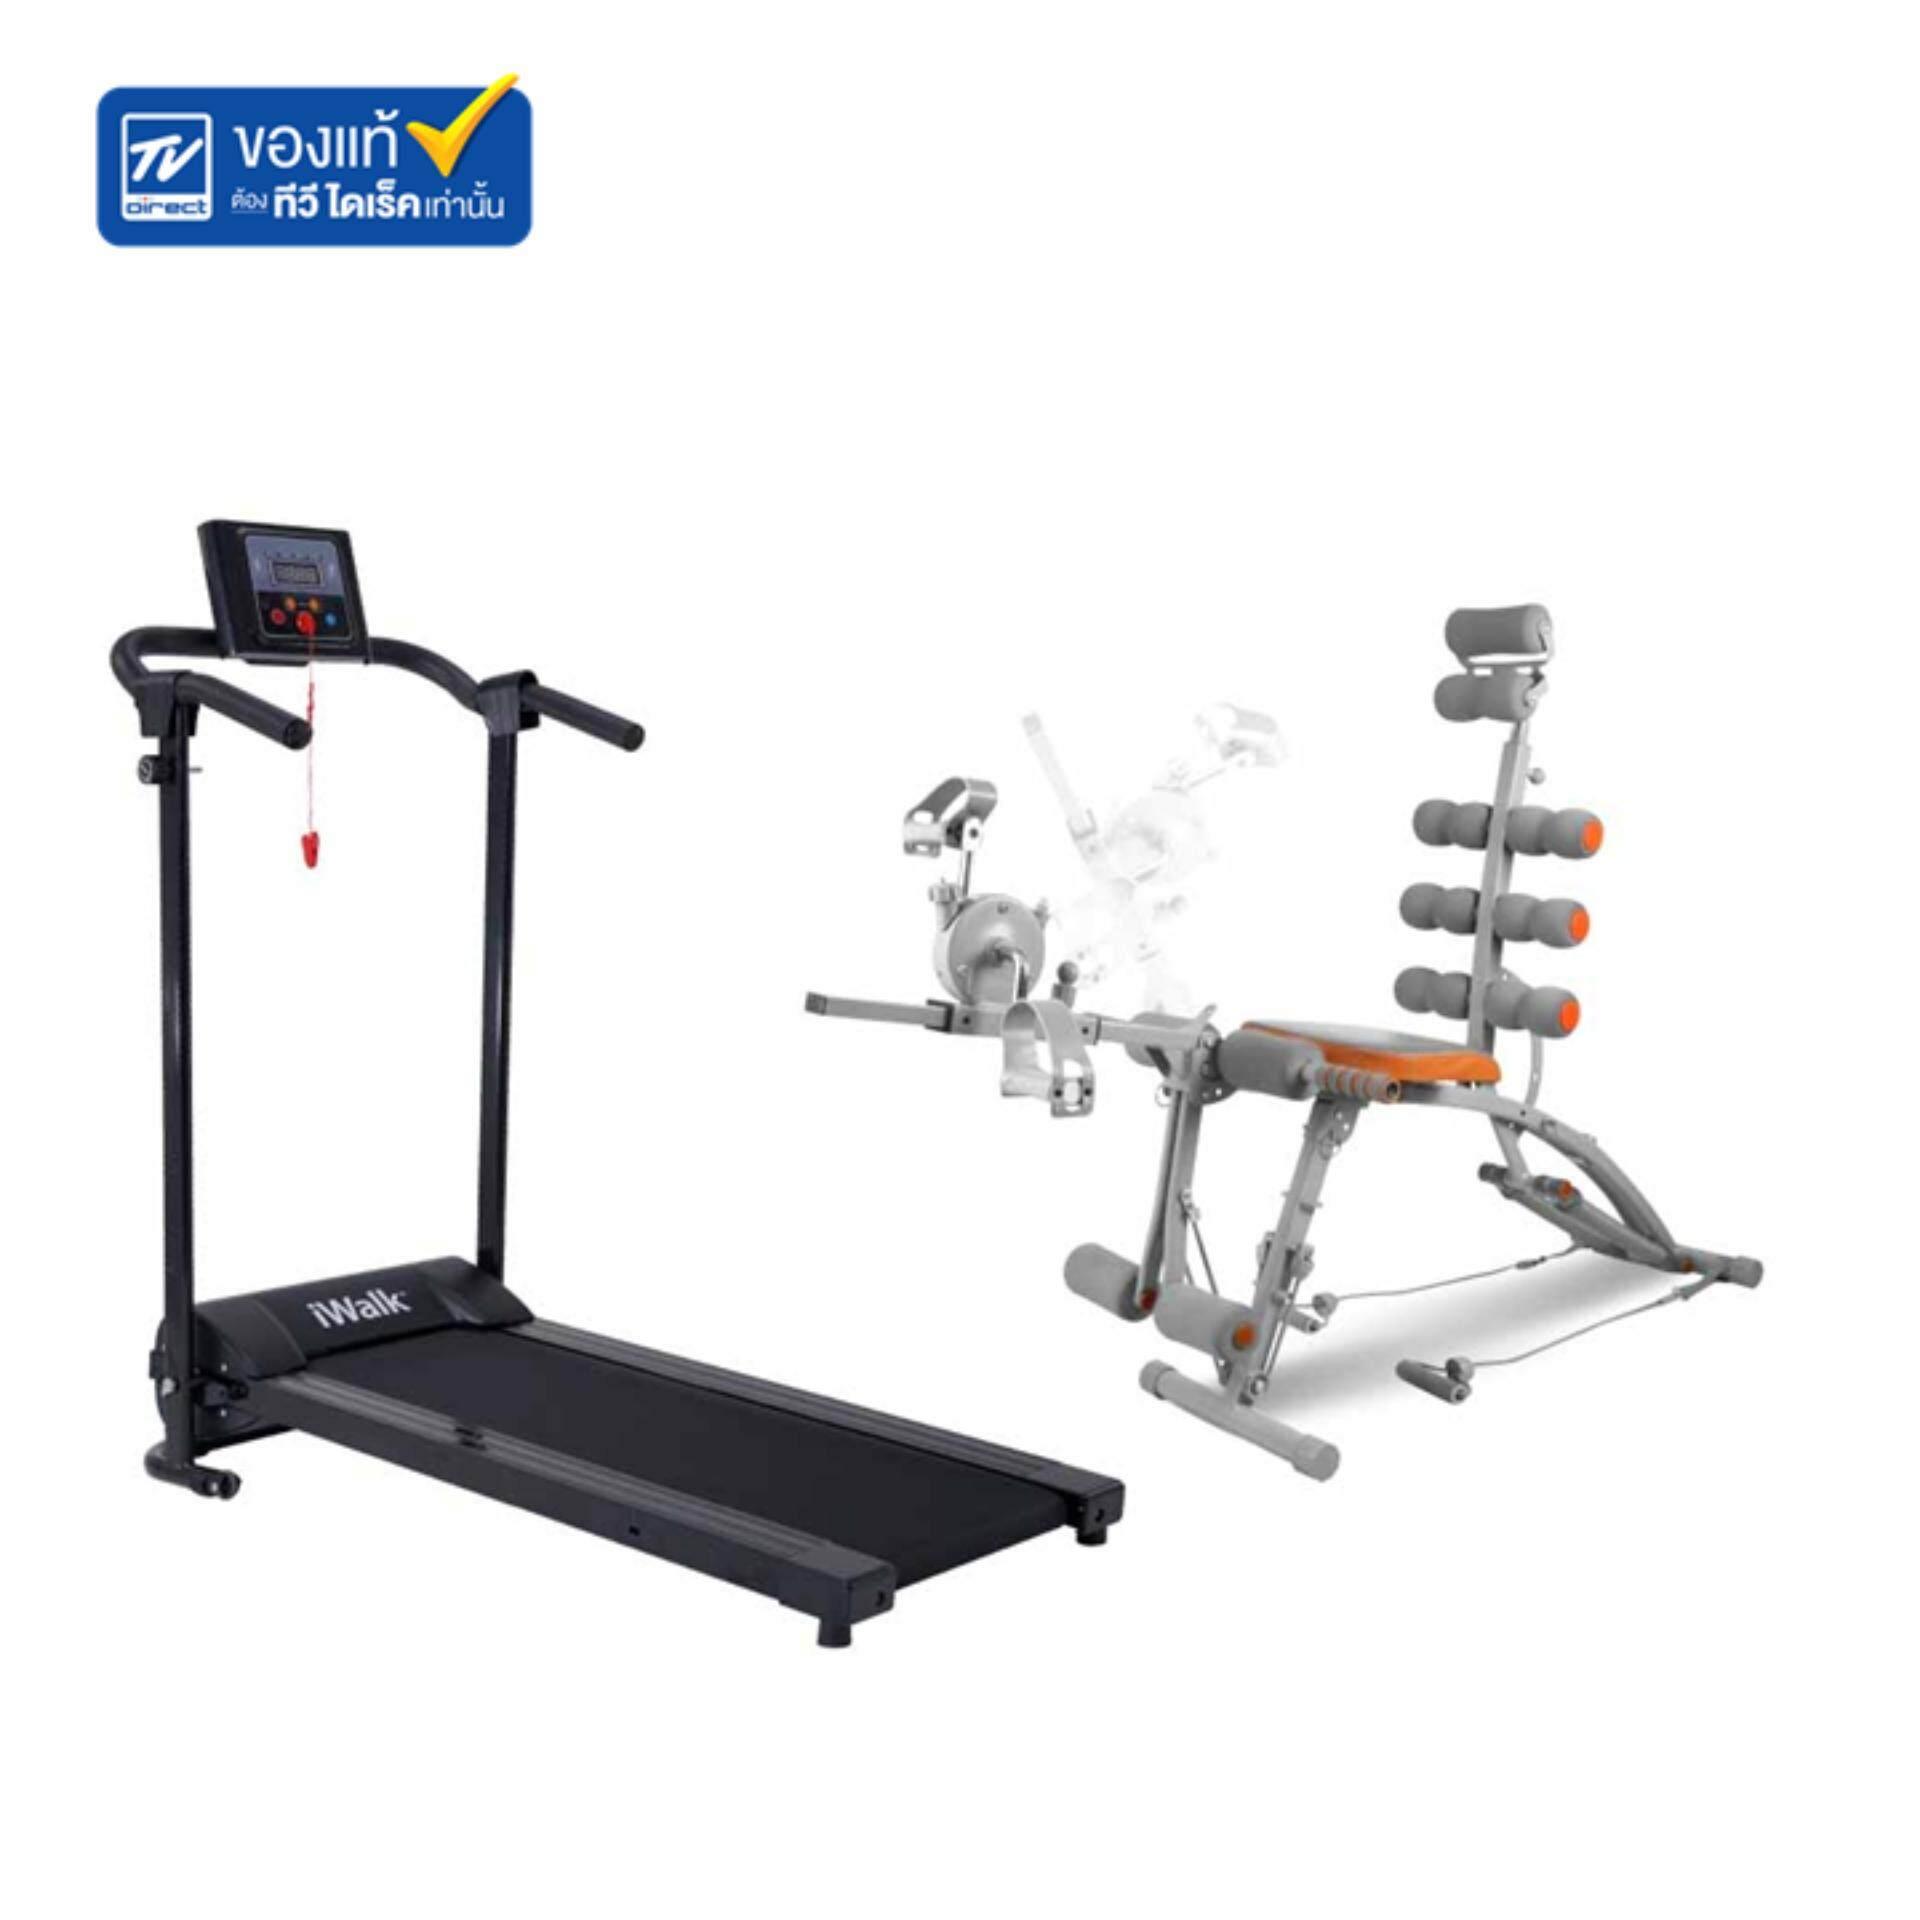 TVDirect  I Walk Treadmill  E318Z Black e ลู่บริหาร สีดำ + The Total Trainer Plus เครื่องบริหารหน้าท้องและร่างกาย